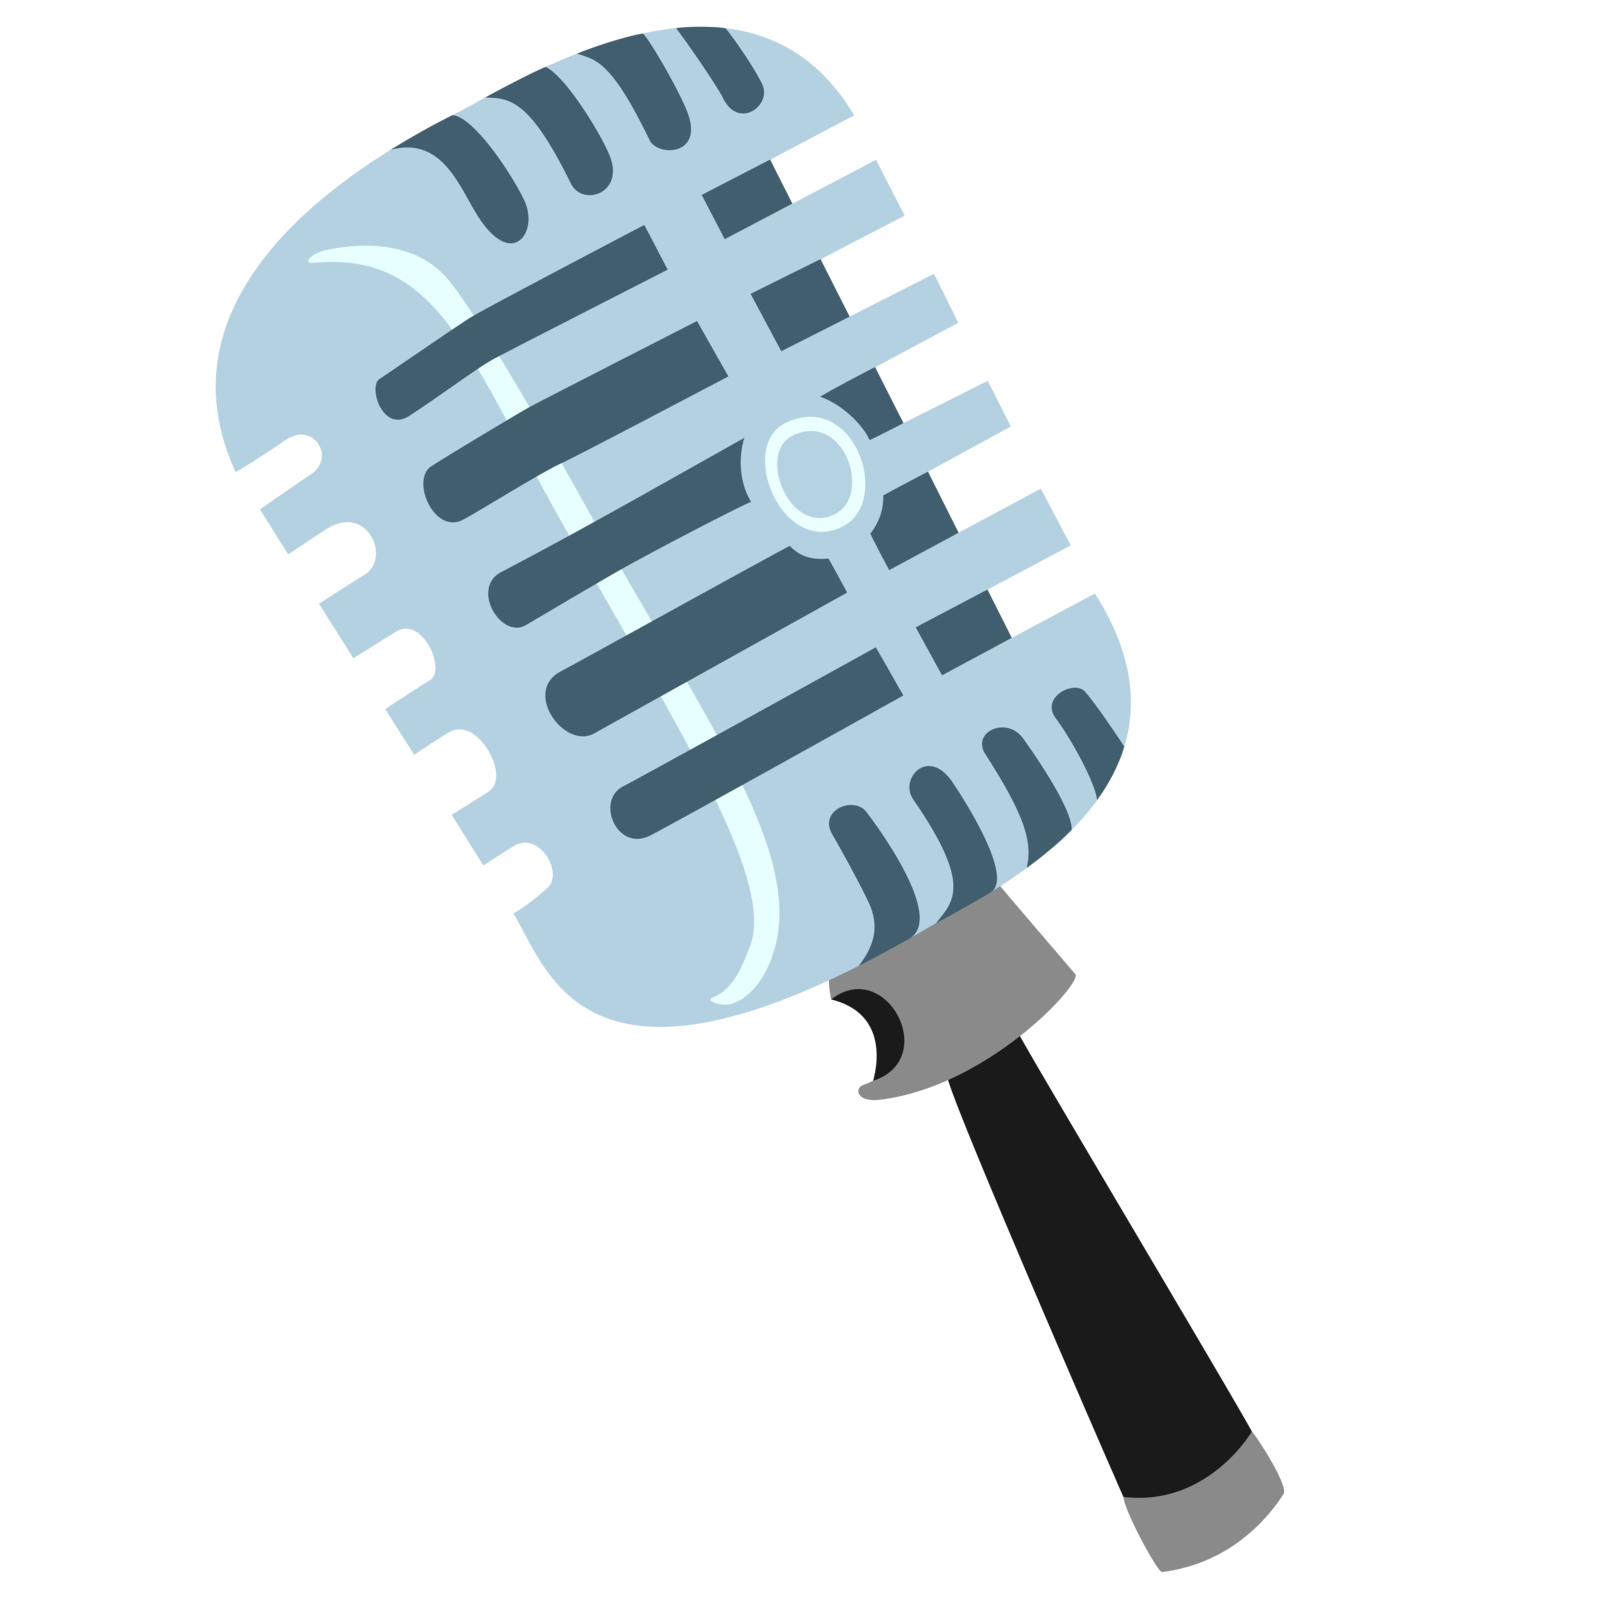 By embersatdawn deviantart com. Microphone vector png